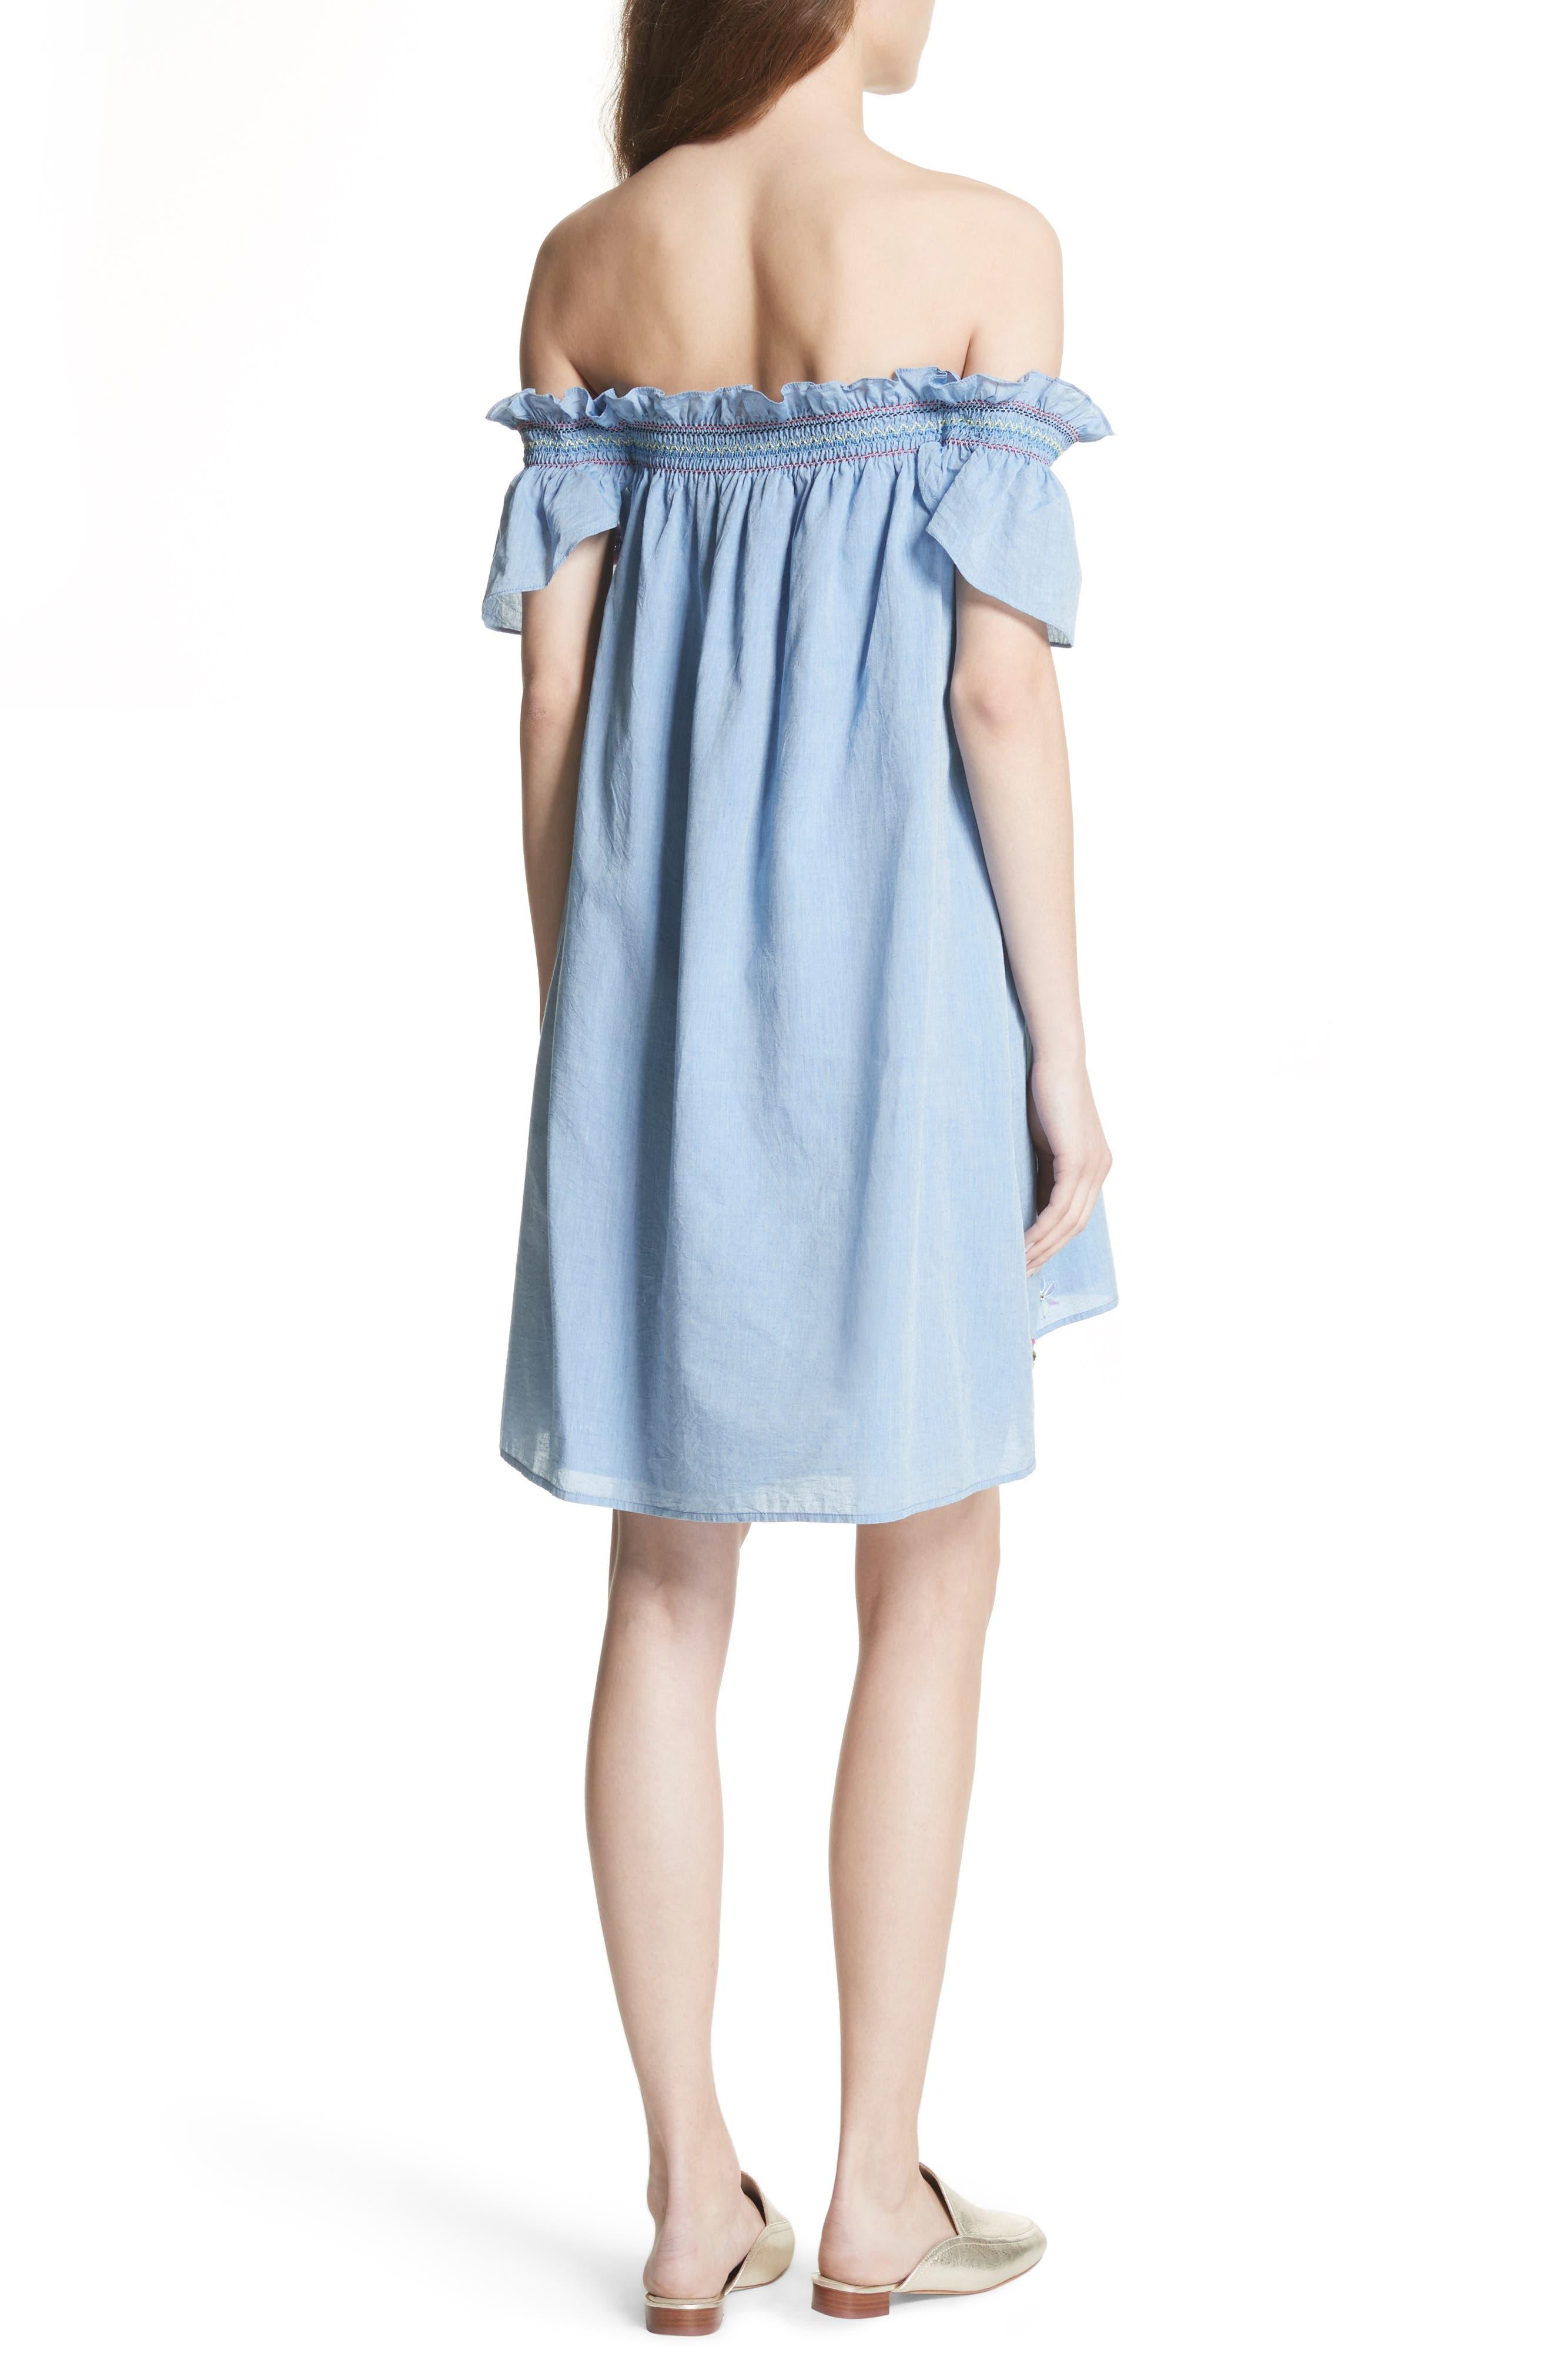 Clarimonde Embroidered Off the Shoulder Cotton Dress,                             Alternate thumbnail 2, color,                             400